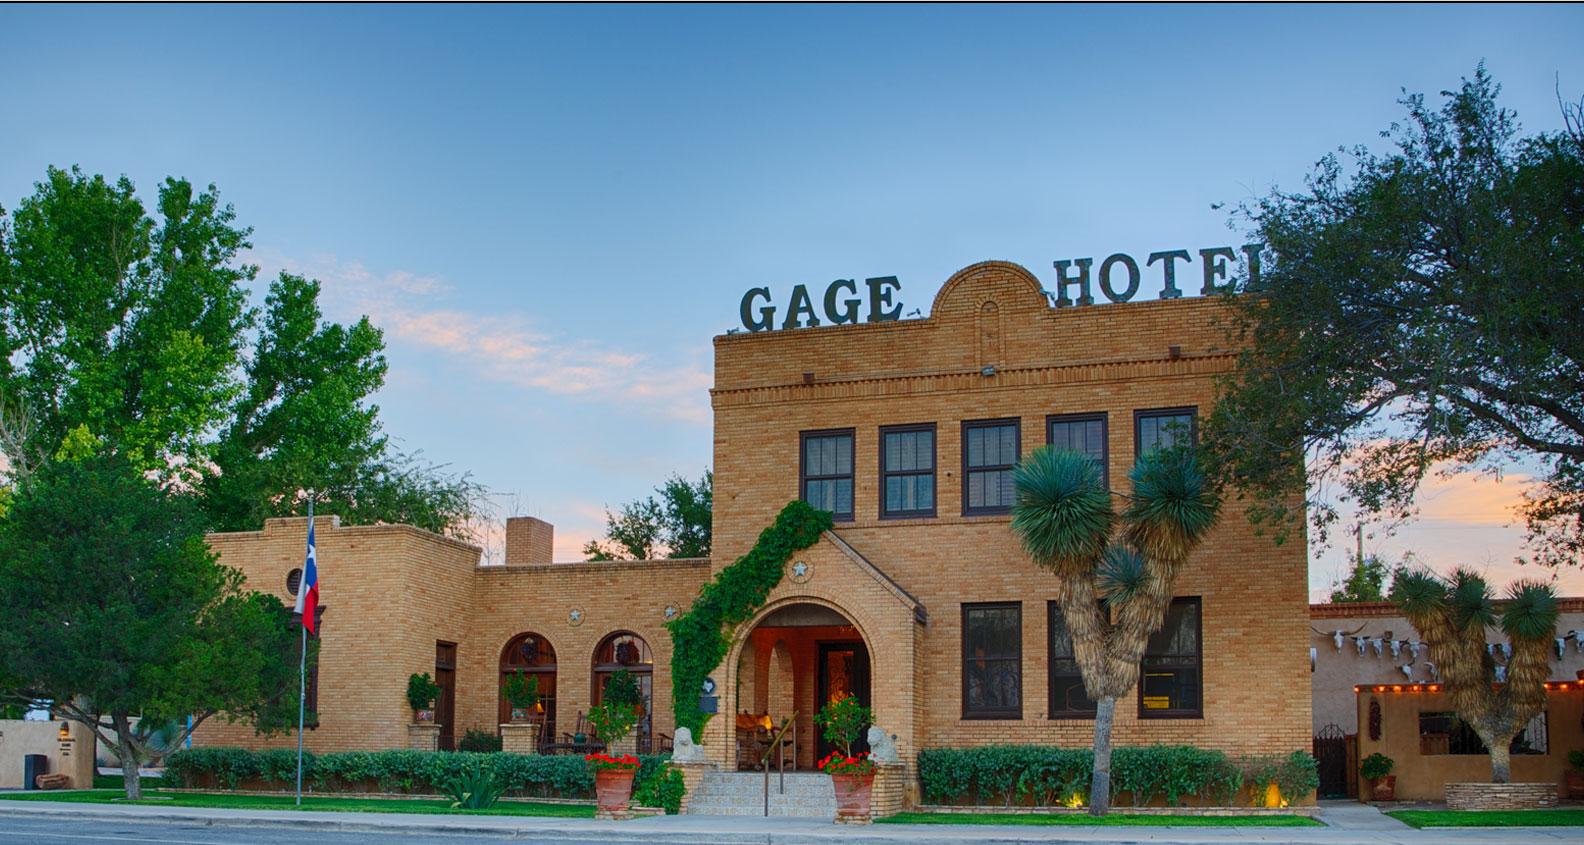 gage hotel marathon texas.jpg